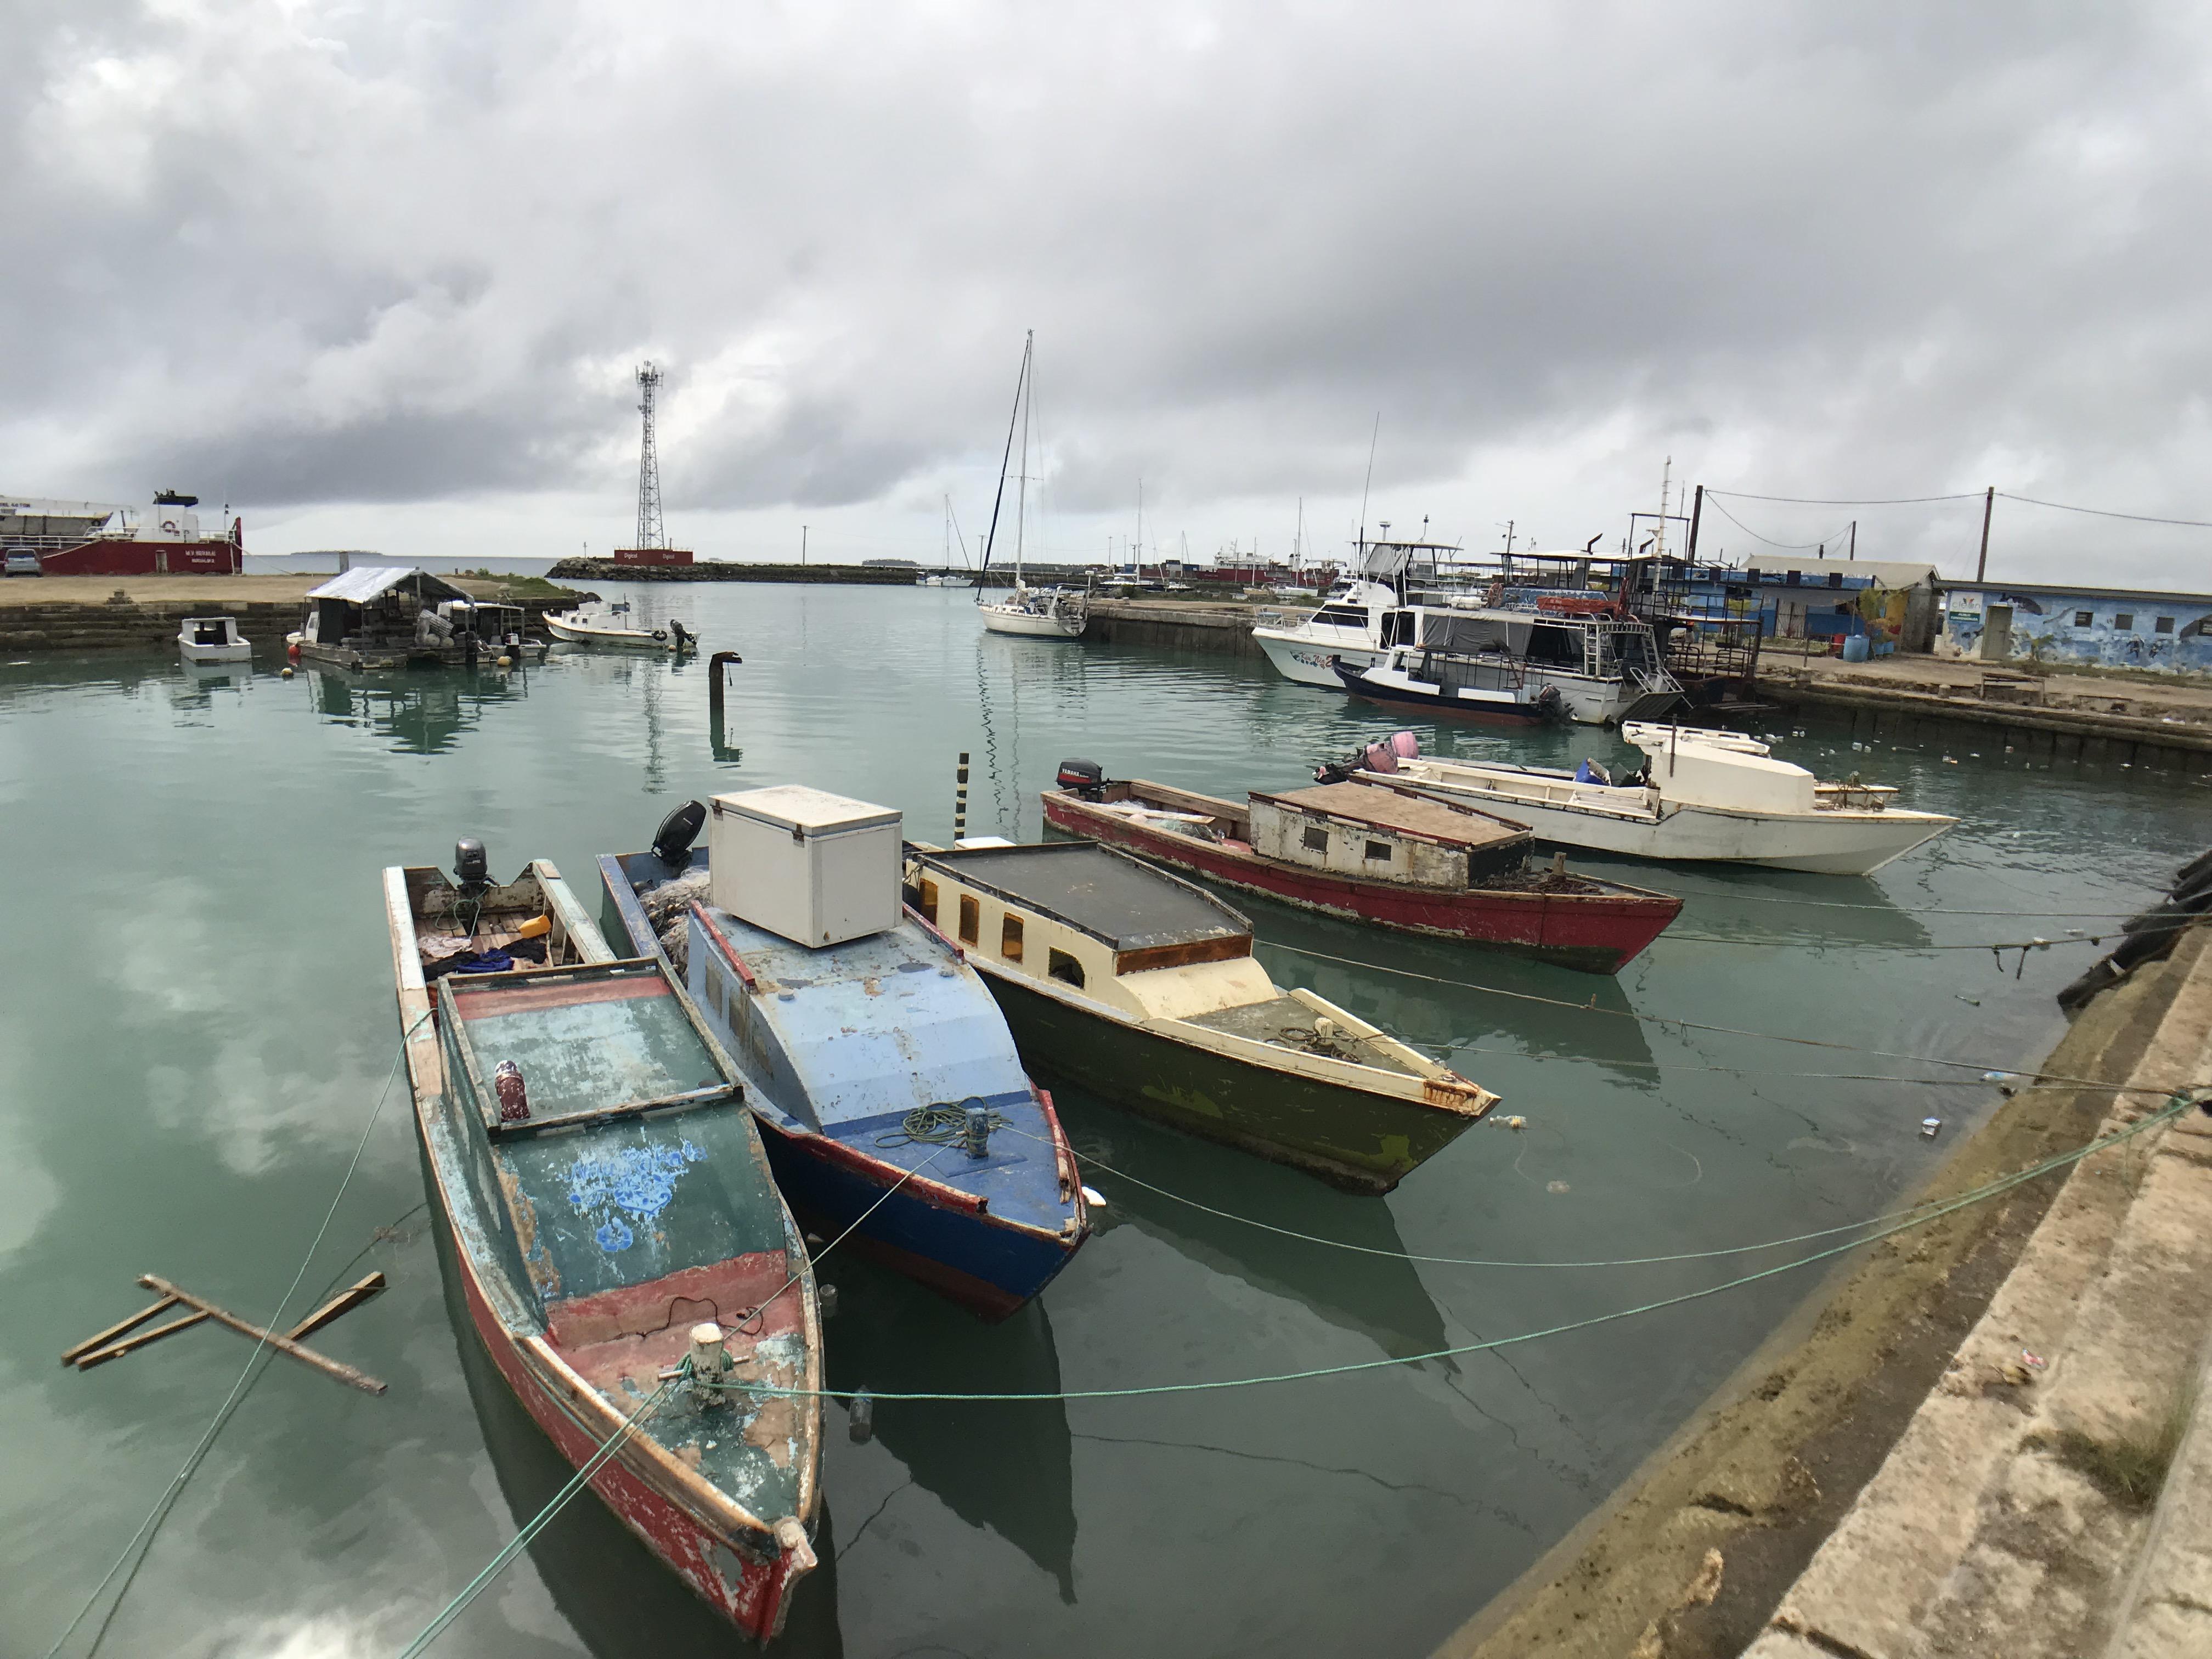 Nuku Alofa Dinghy dock